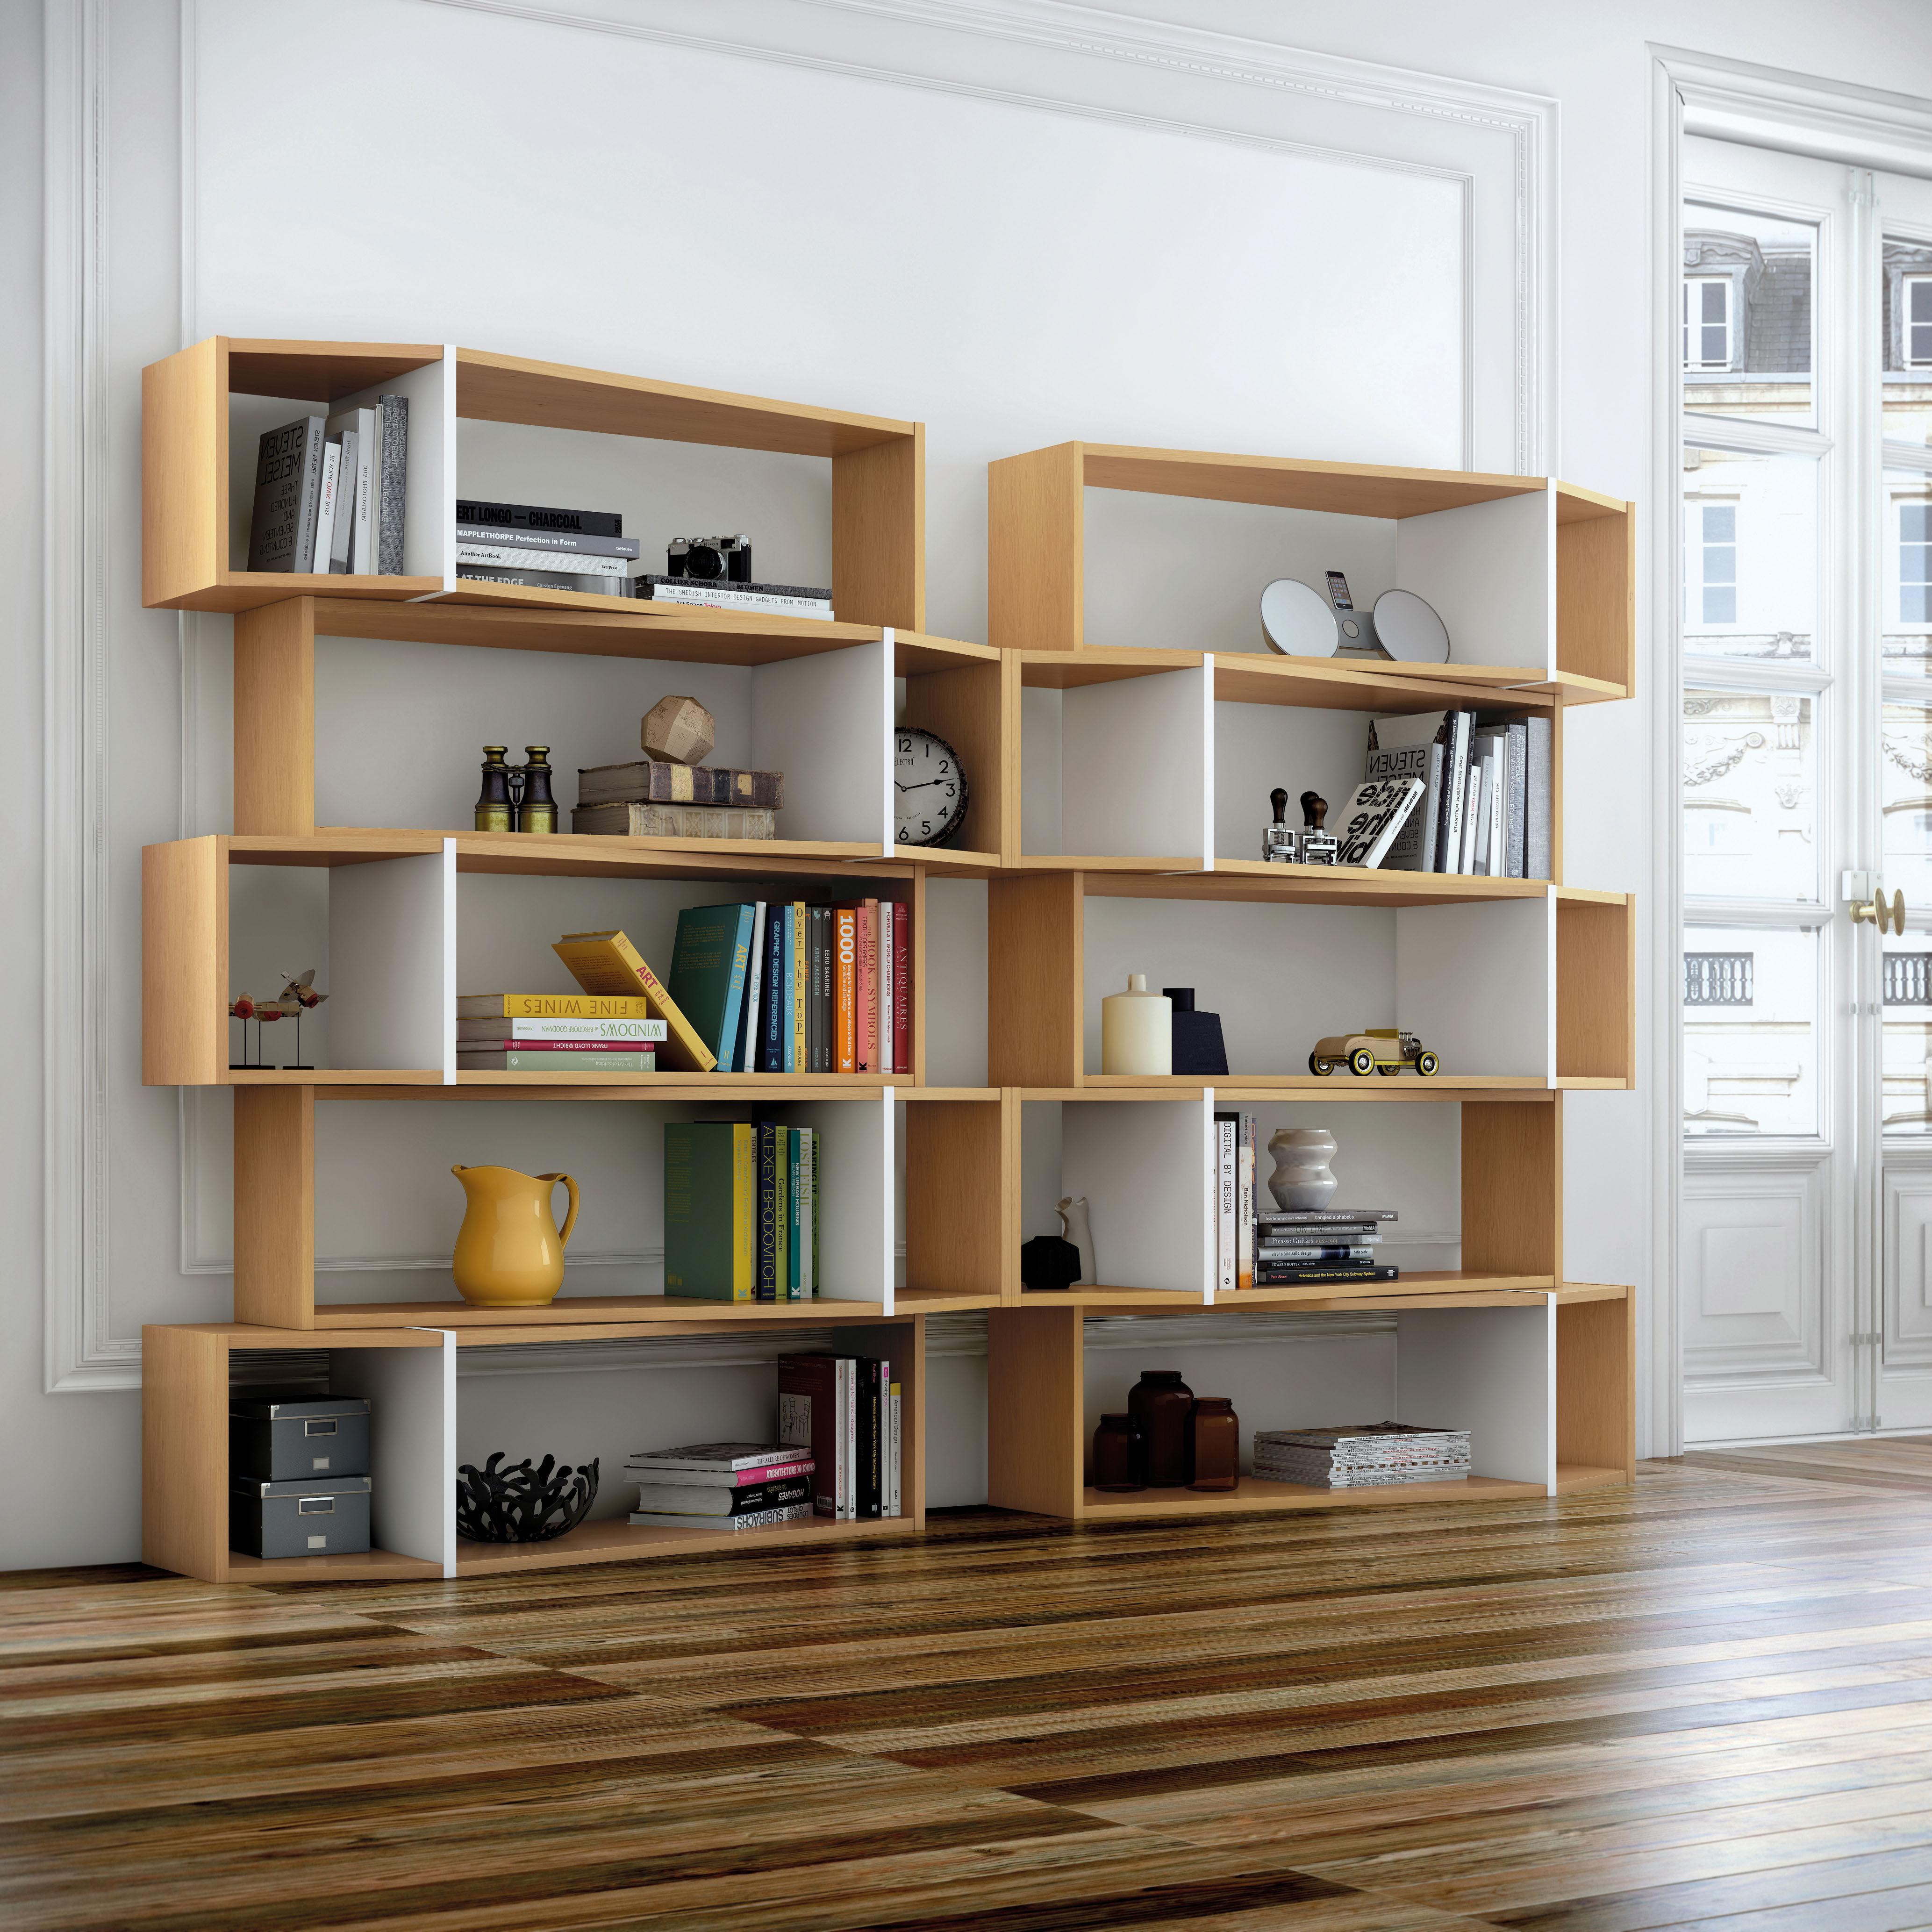 etag re rectangular l 120 x h 35 cm ch ne noir pop up home. Black Bedroom Furniture Sets. Home Design Ideas